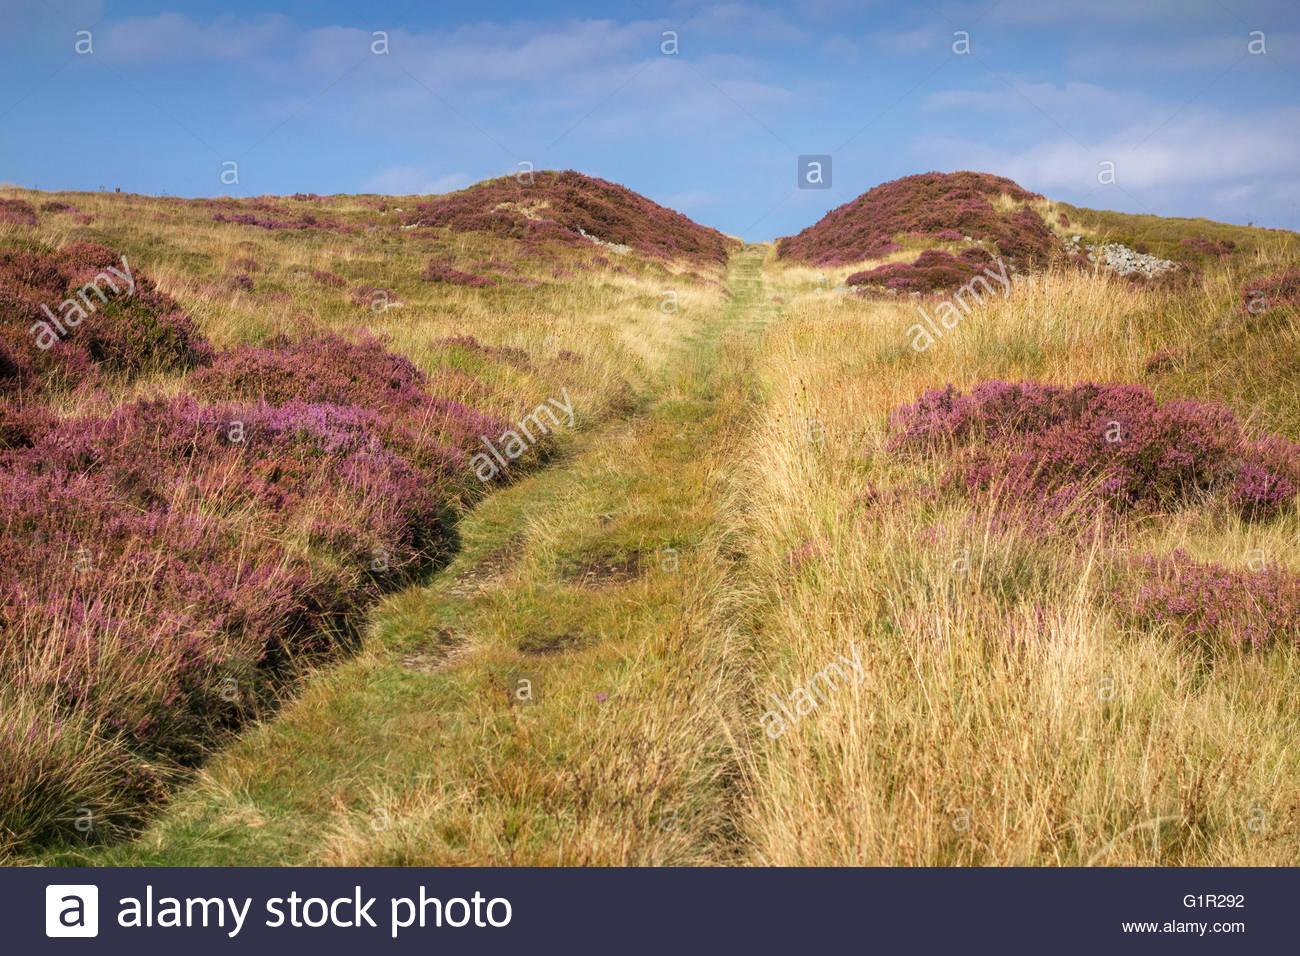 Dyne Steel tramroad incline Blaenavon World Heritage Site, Torfaen Wales UK - Stock Image